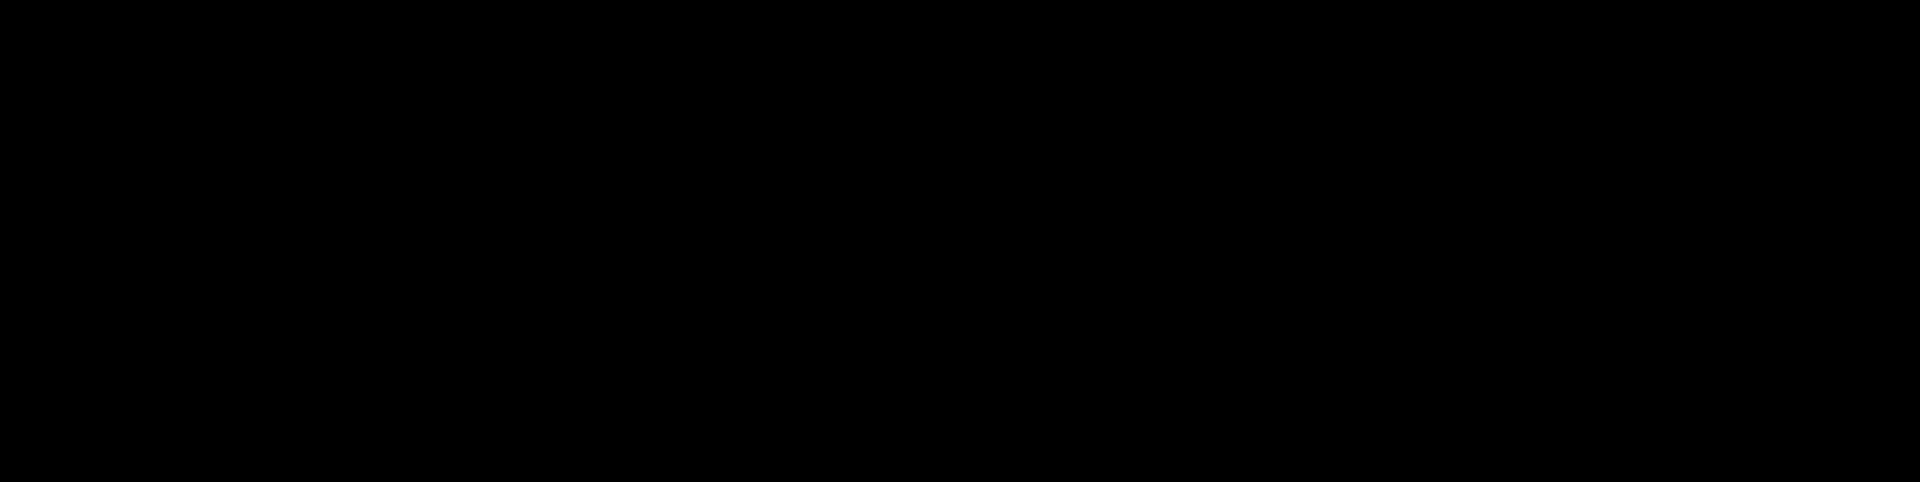 Logo for Lucas Madebos